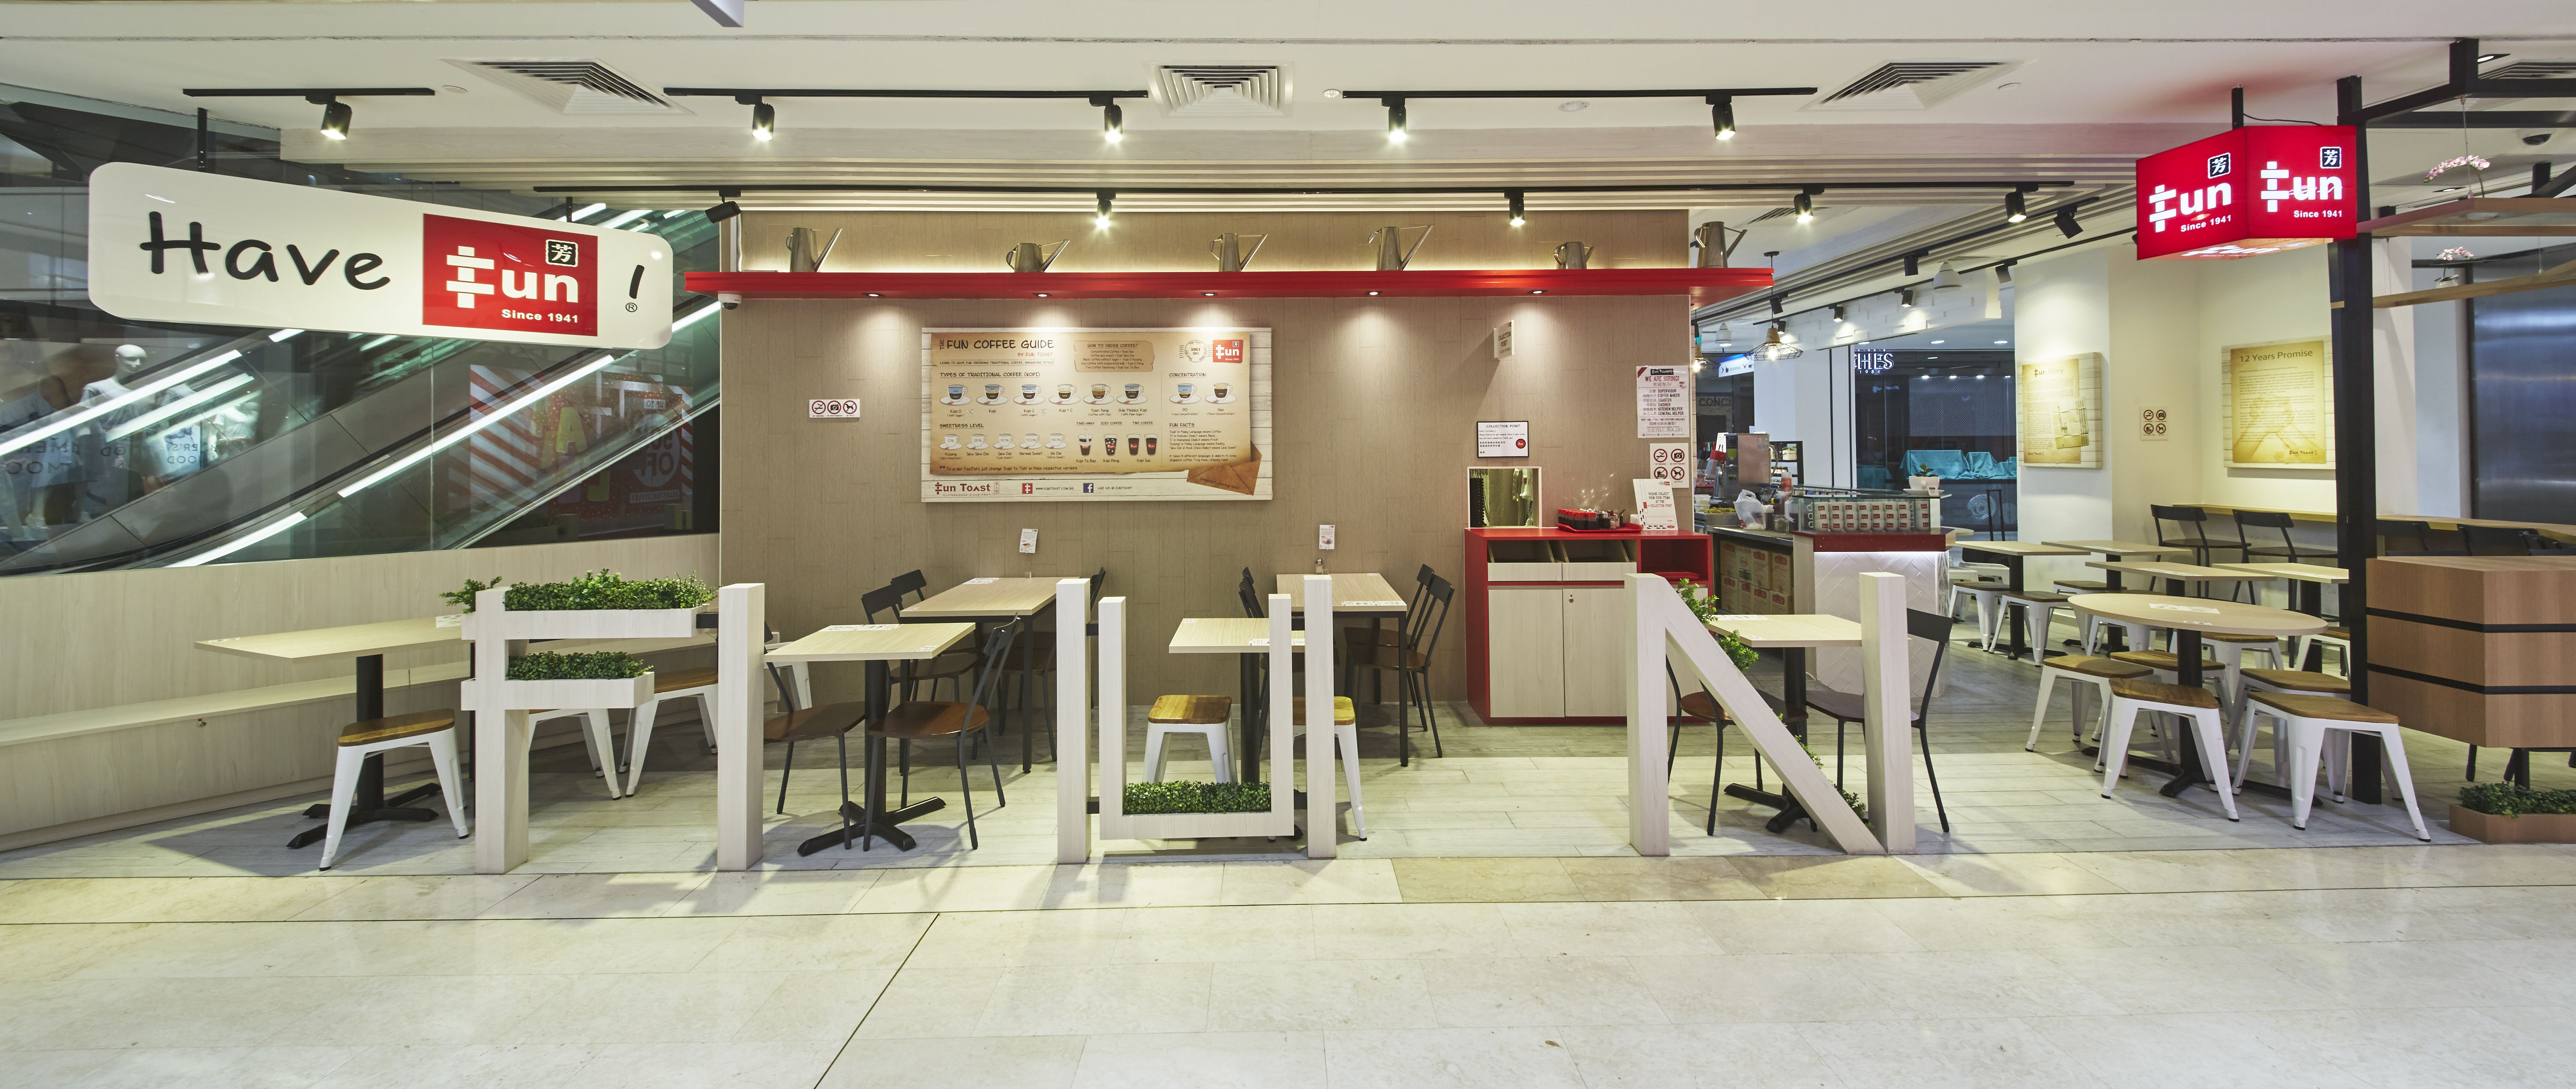 Funtoast Singapore Carpenters Interior Design Commercial Project